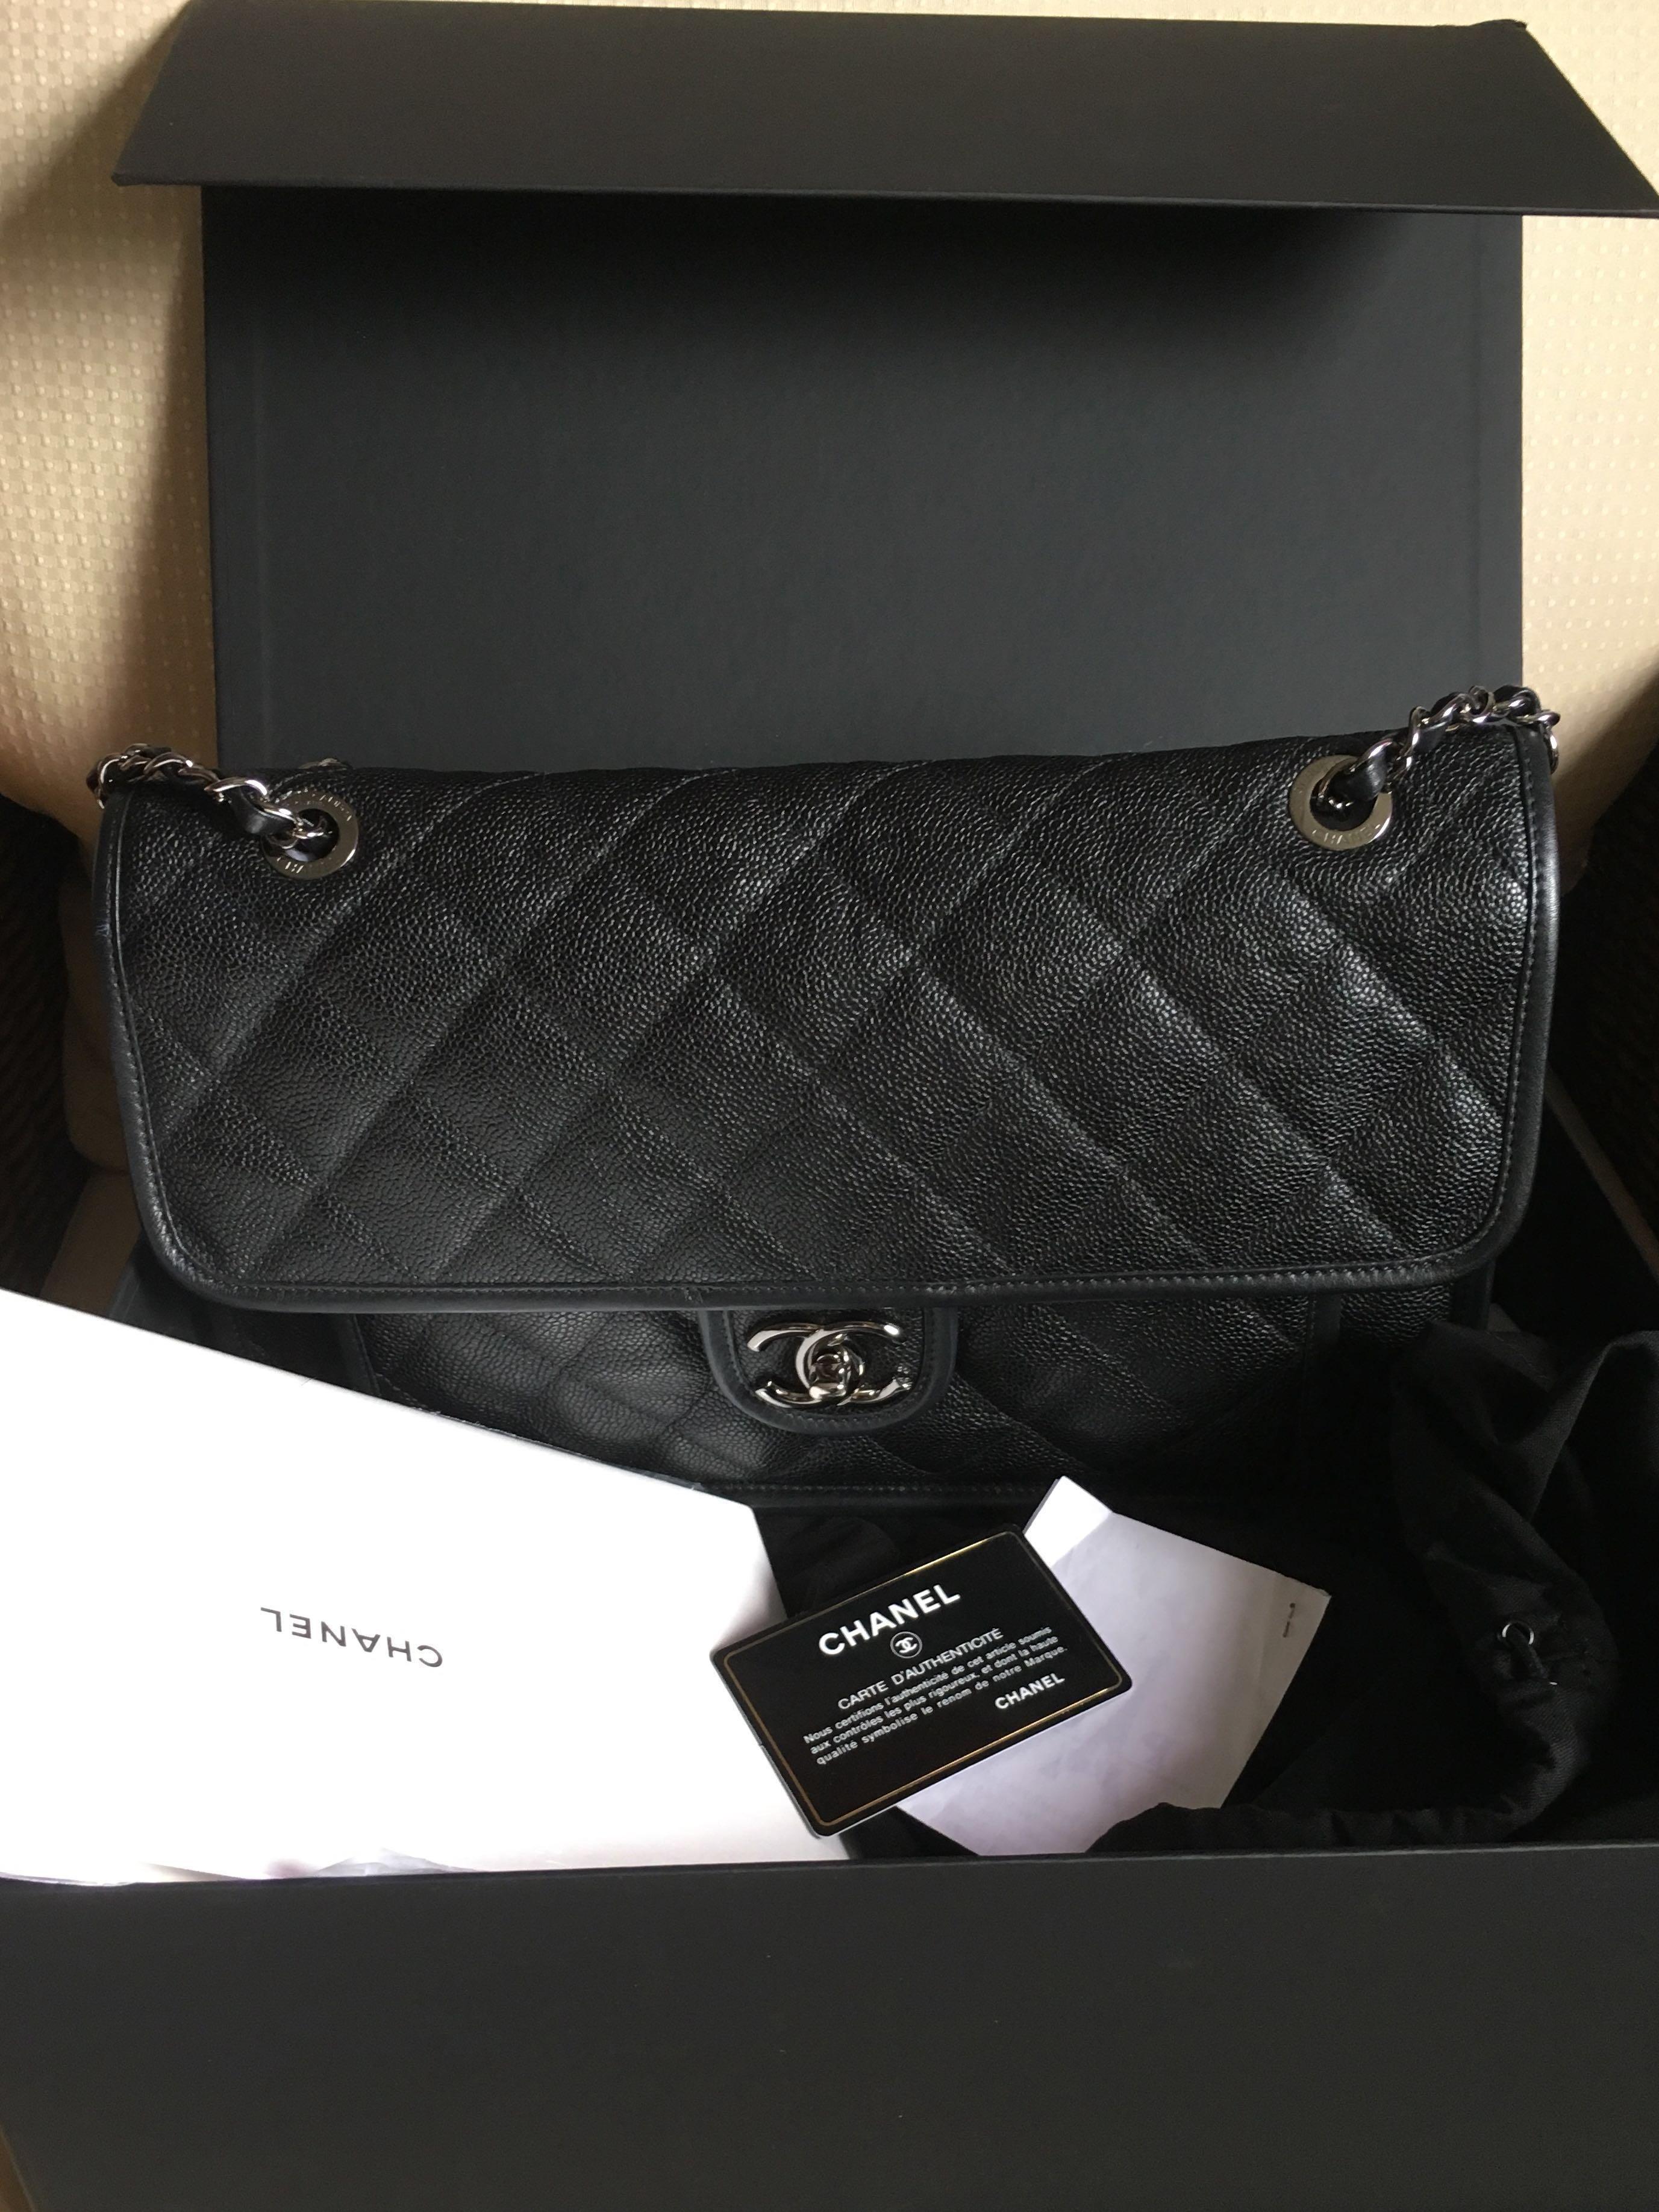 9a469df6297f Chanel jumbo French Riviera flap, Luxury, Bags & Wallets, Handbags ...